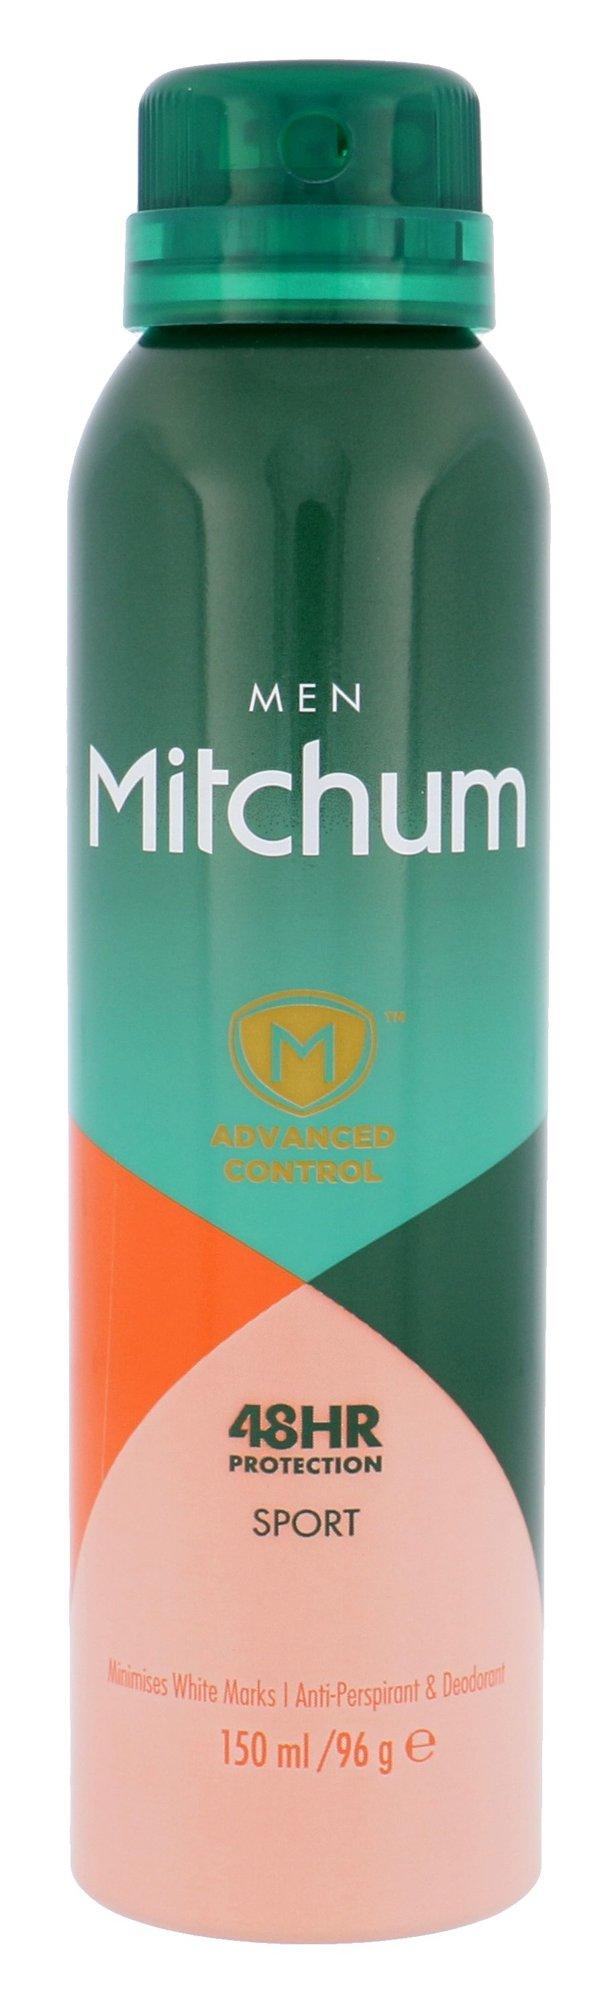 Mitchum Sport Anti-Perspirant Deo Spray 48HR Cosmetic 150ml